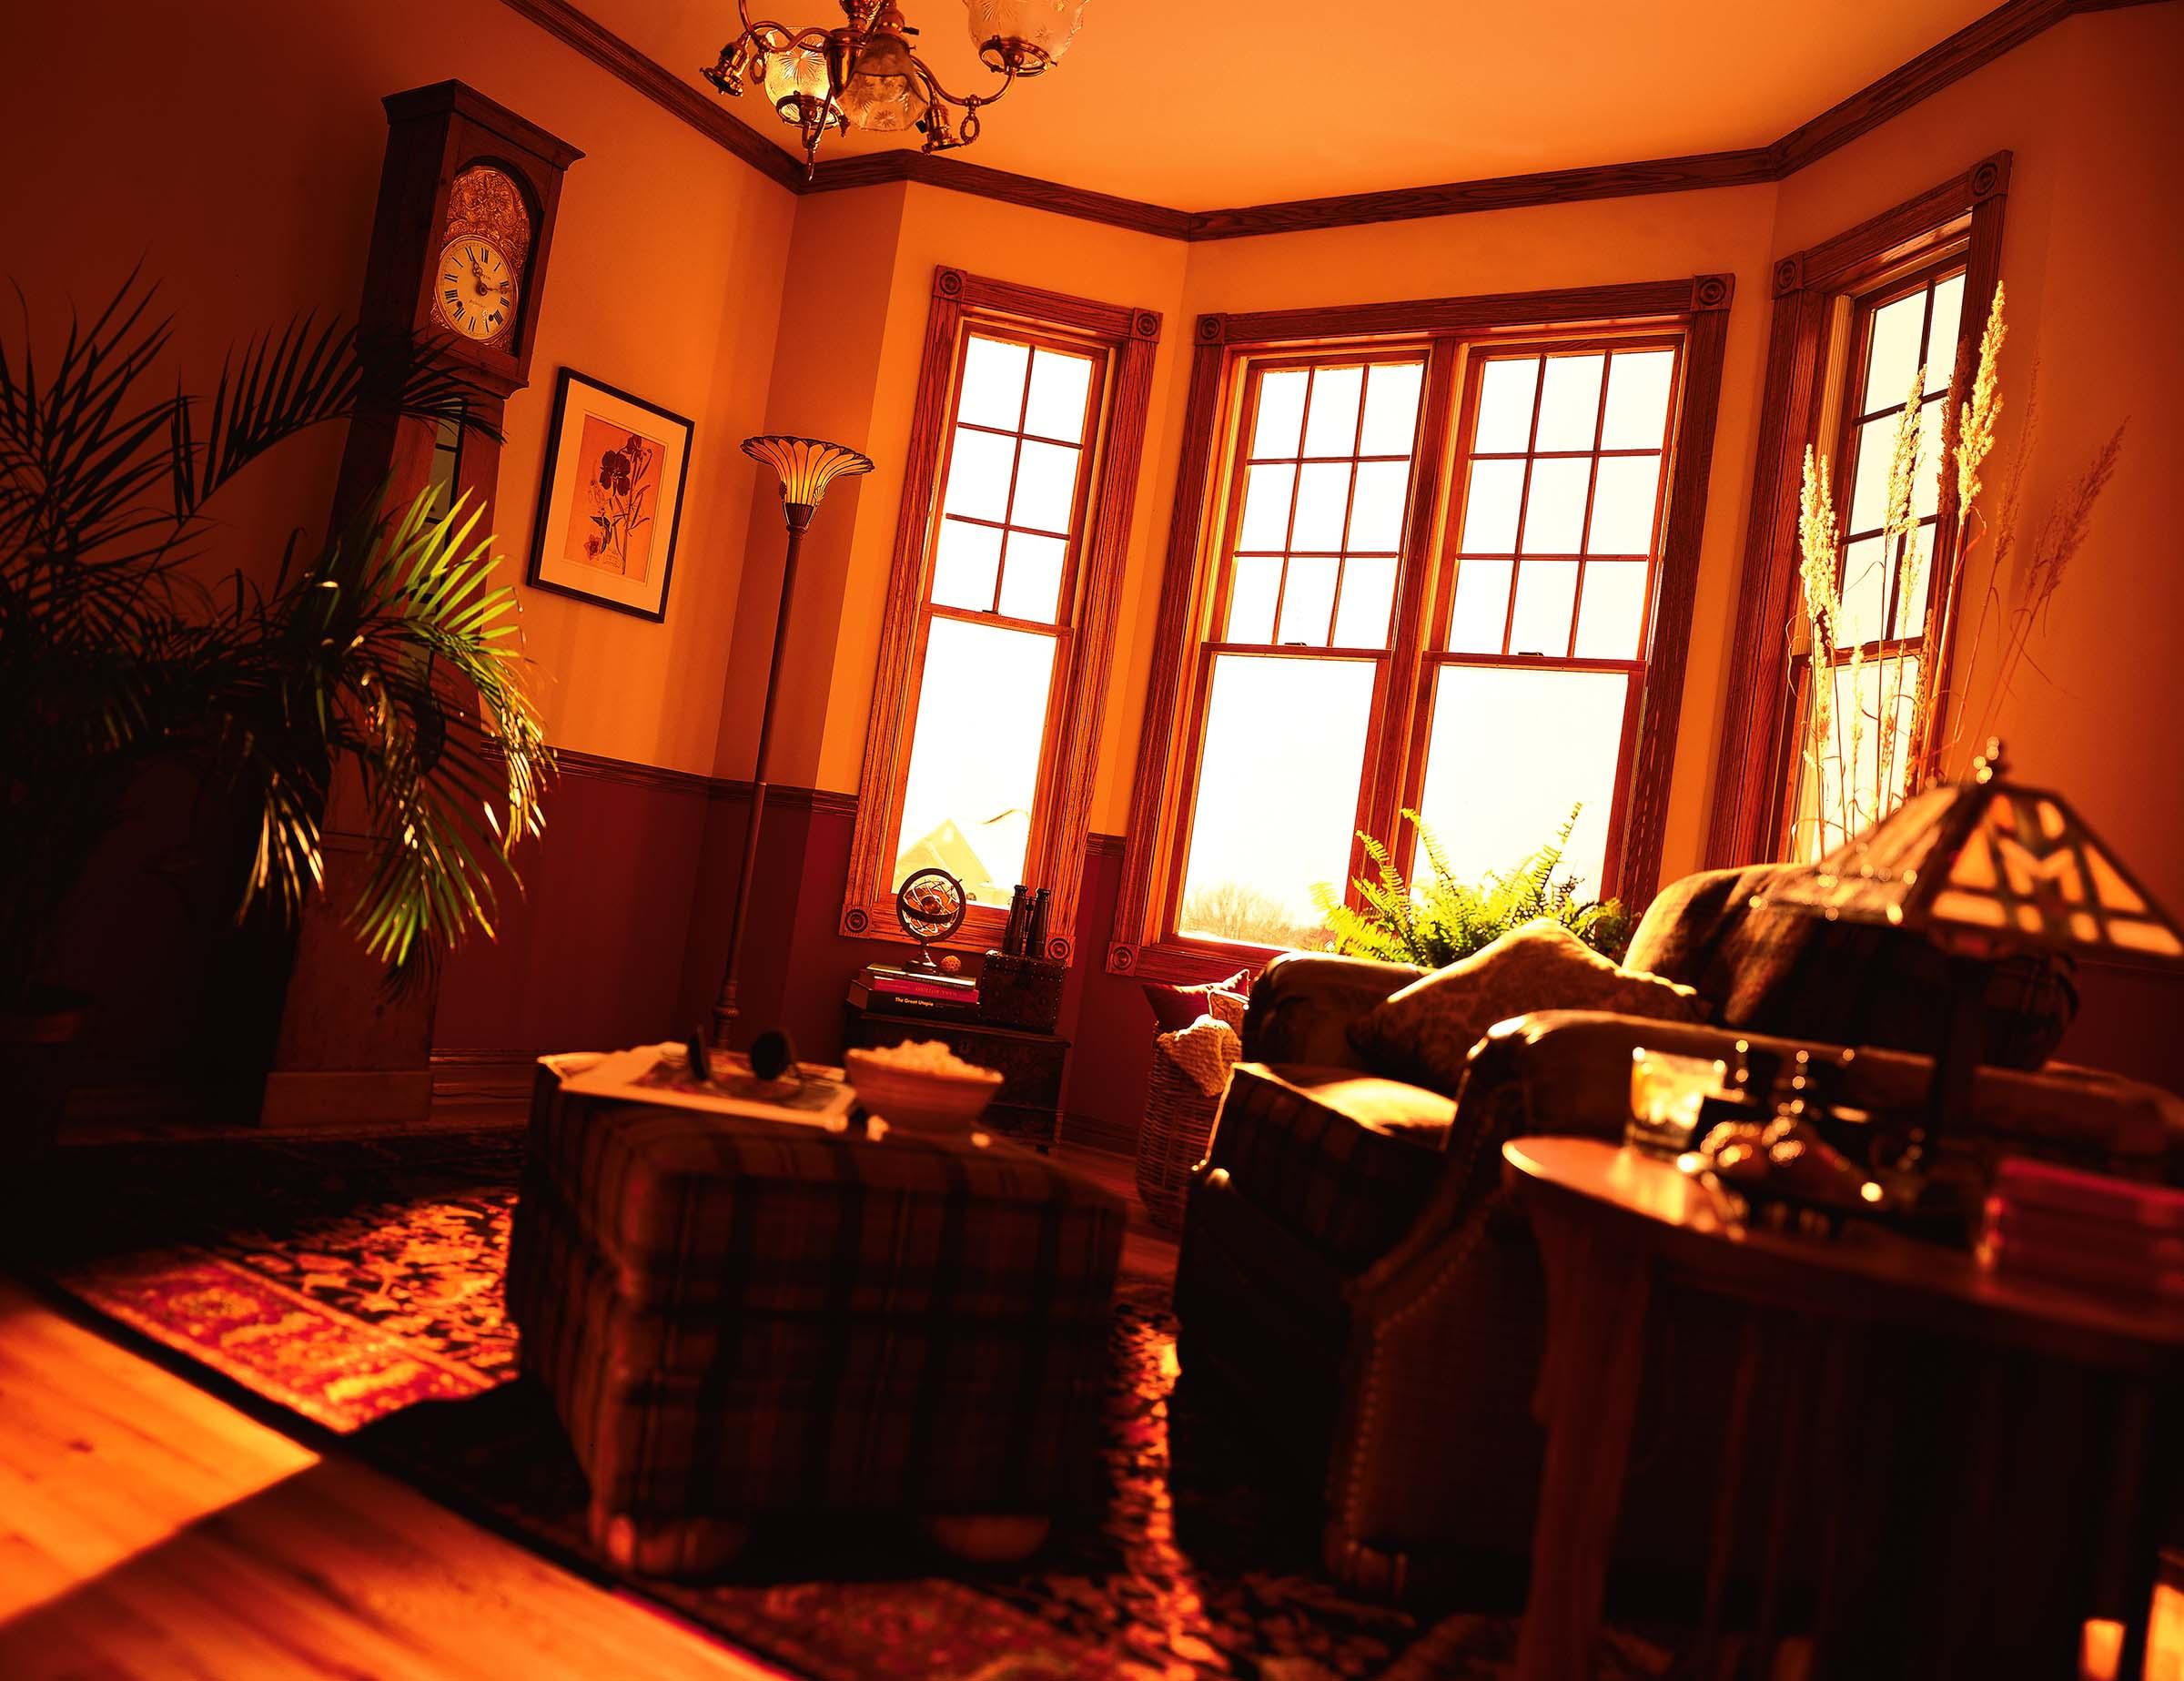 100 Farmhouse Styles The New Urban Farmhouse Chic  : farmhouse style grilles from 45.76.66.238 size 2400 x 1847 jpeg 356kB